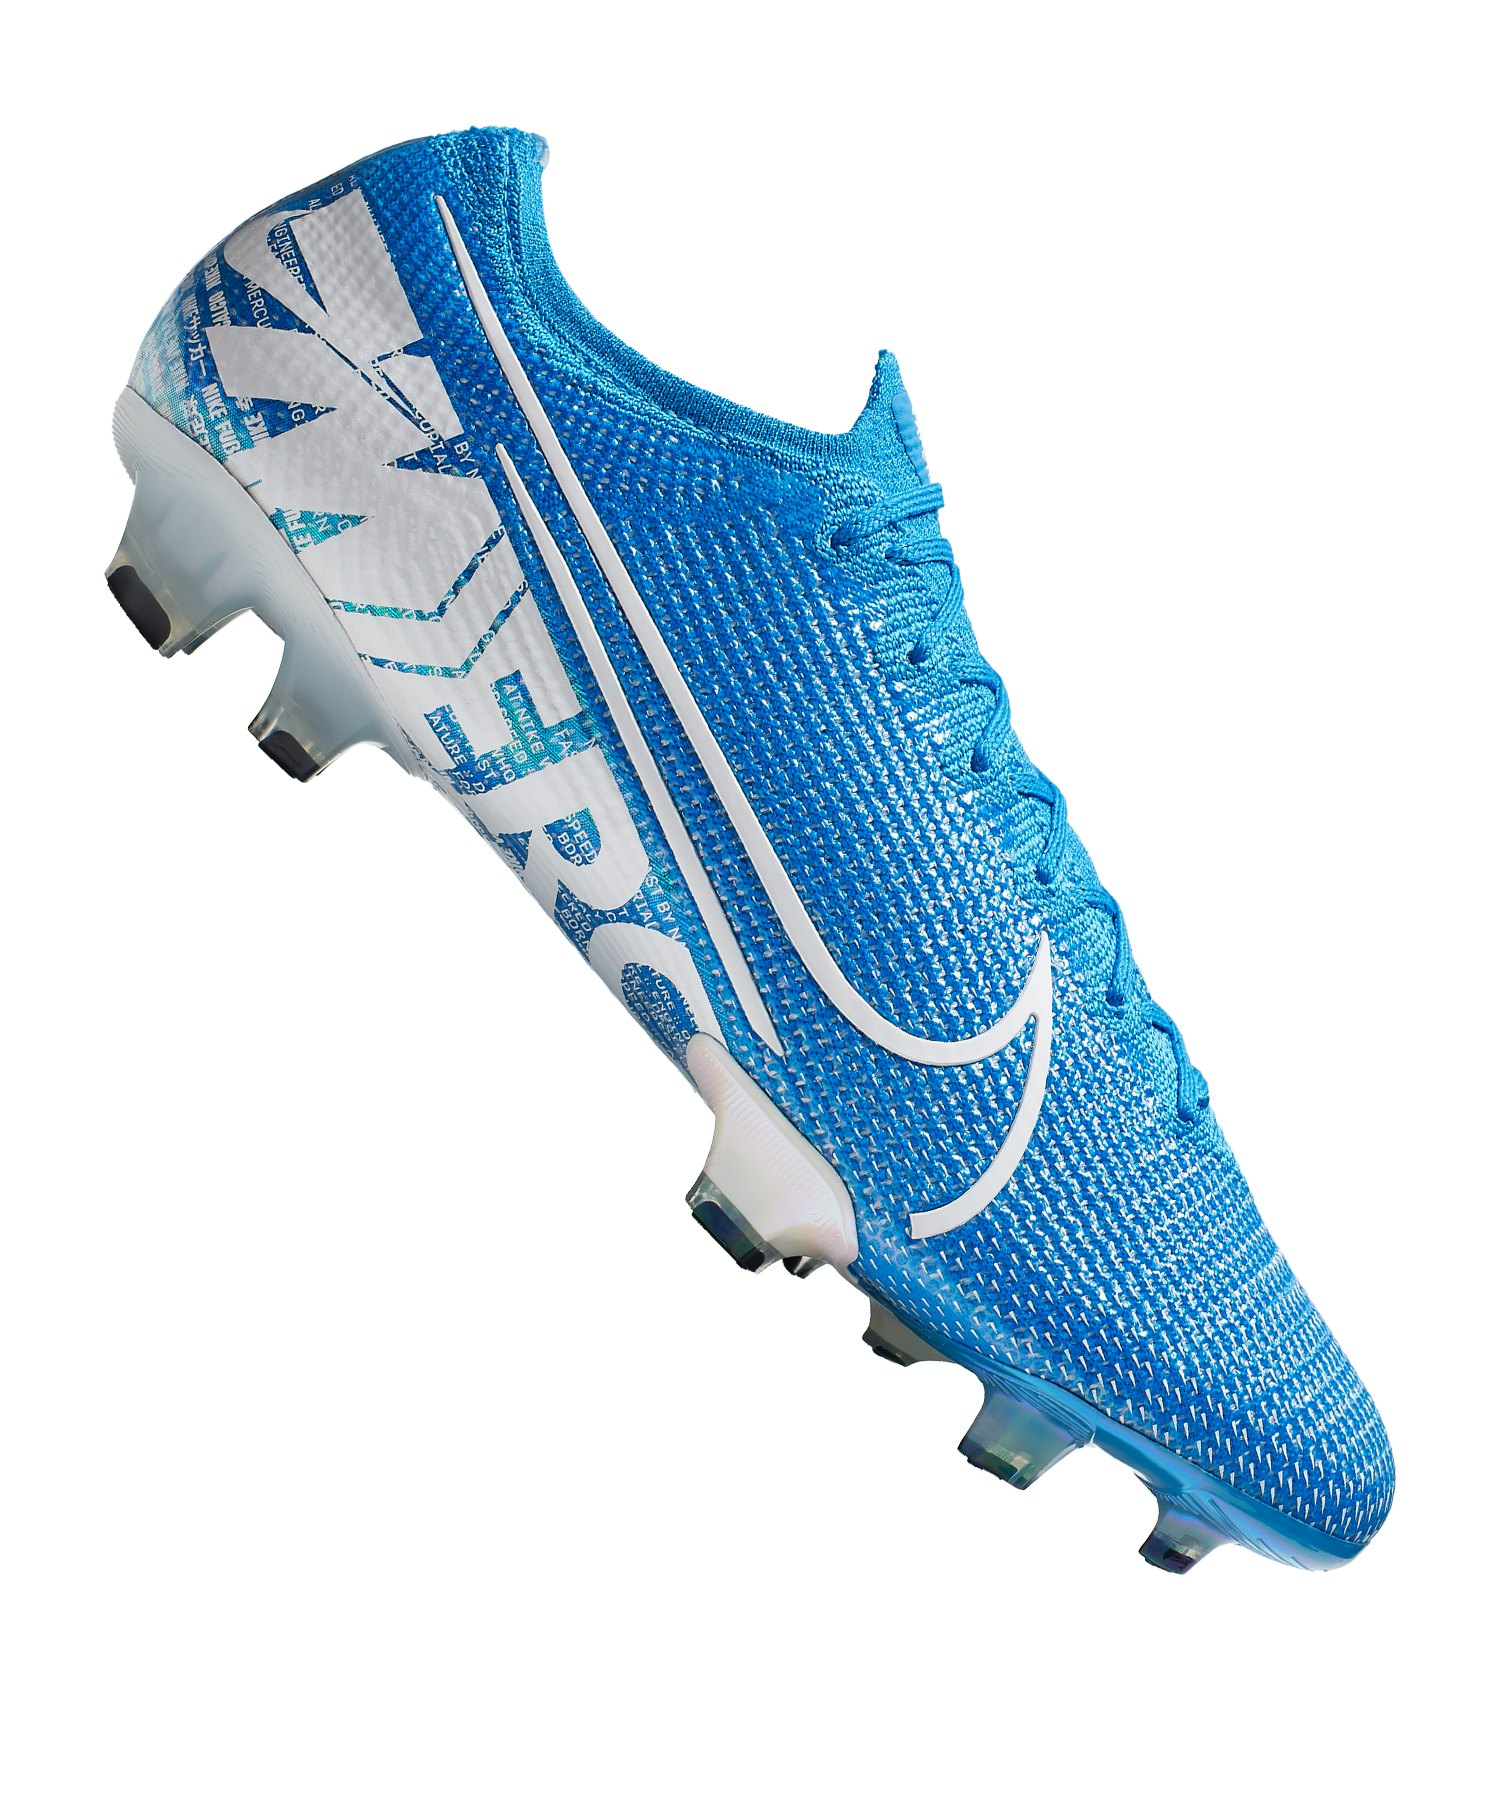 Nike Mercurial Vapor XIII Elite FG Blau Weiss F414 - blau